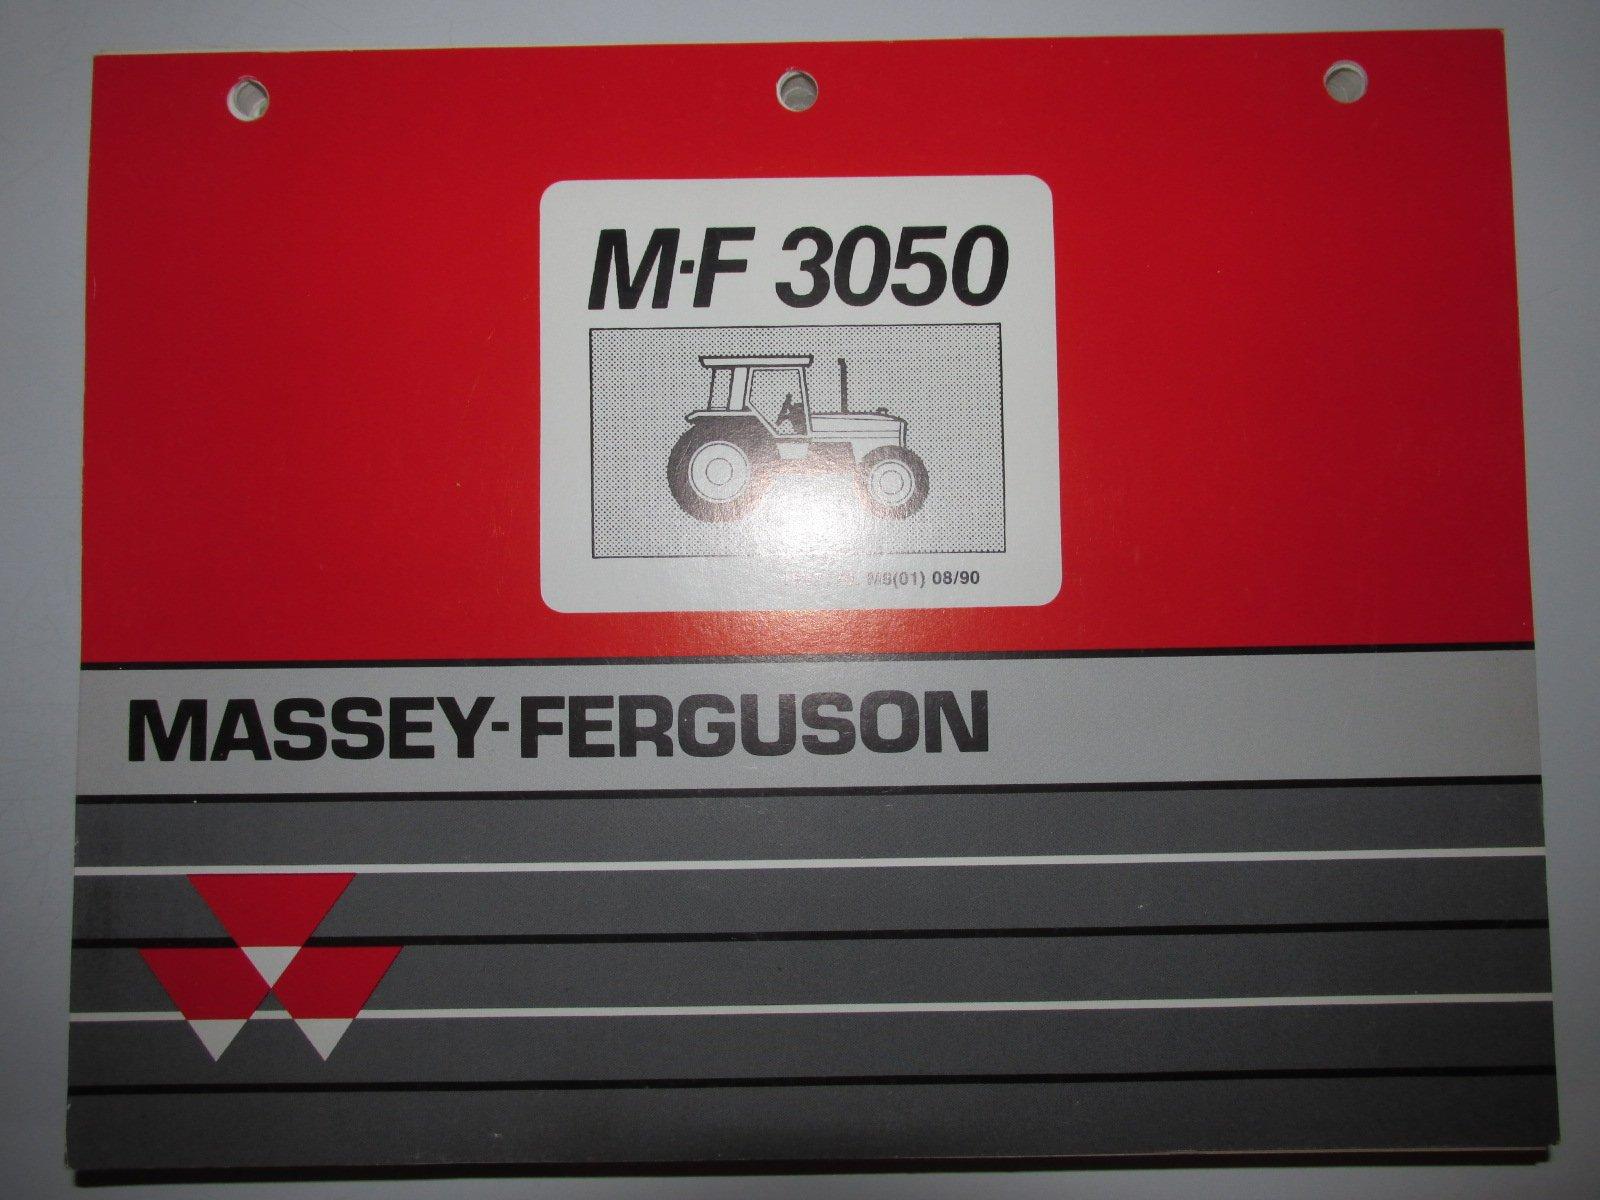 Massey Ferguson MF 3050 Tractor Parts Catalog Book Manual Original ...